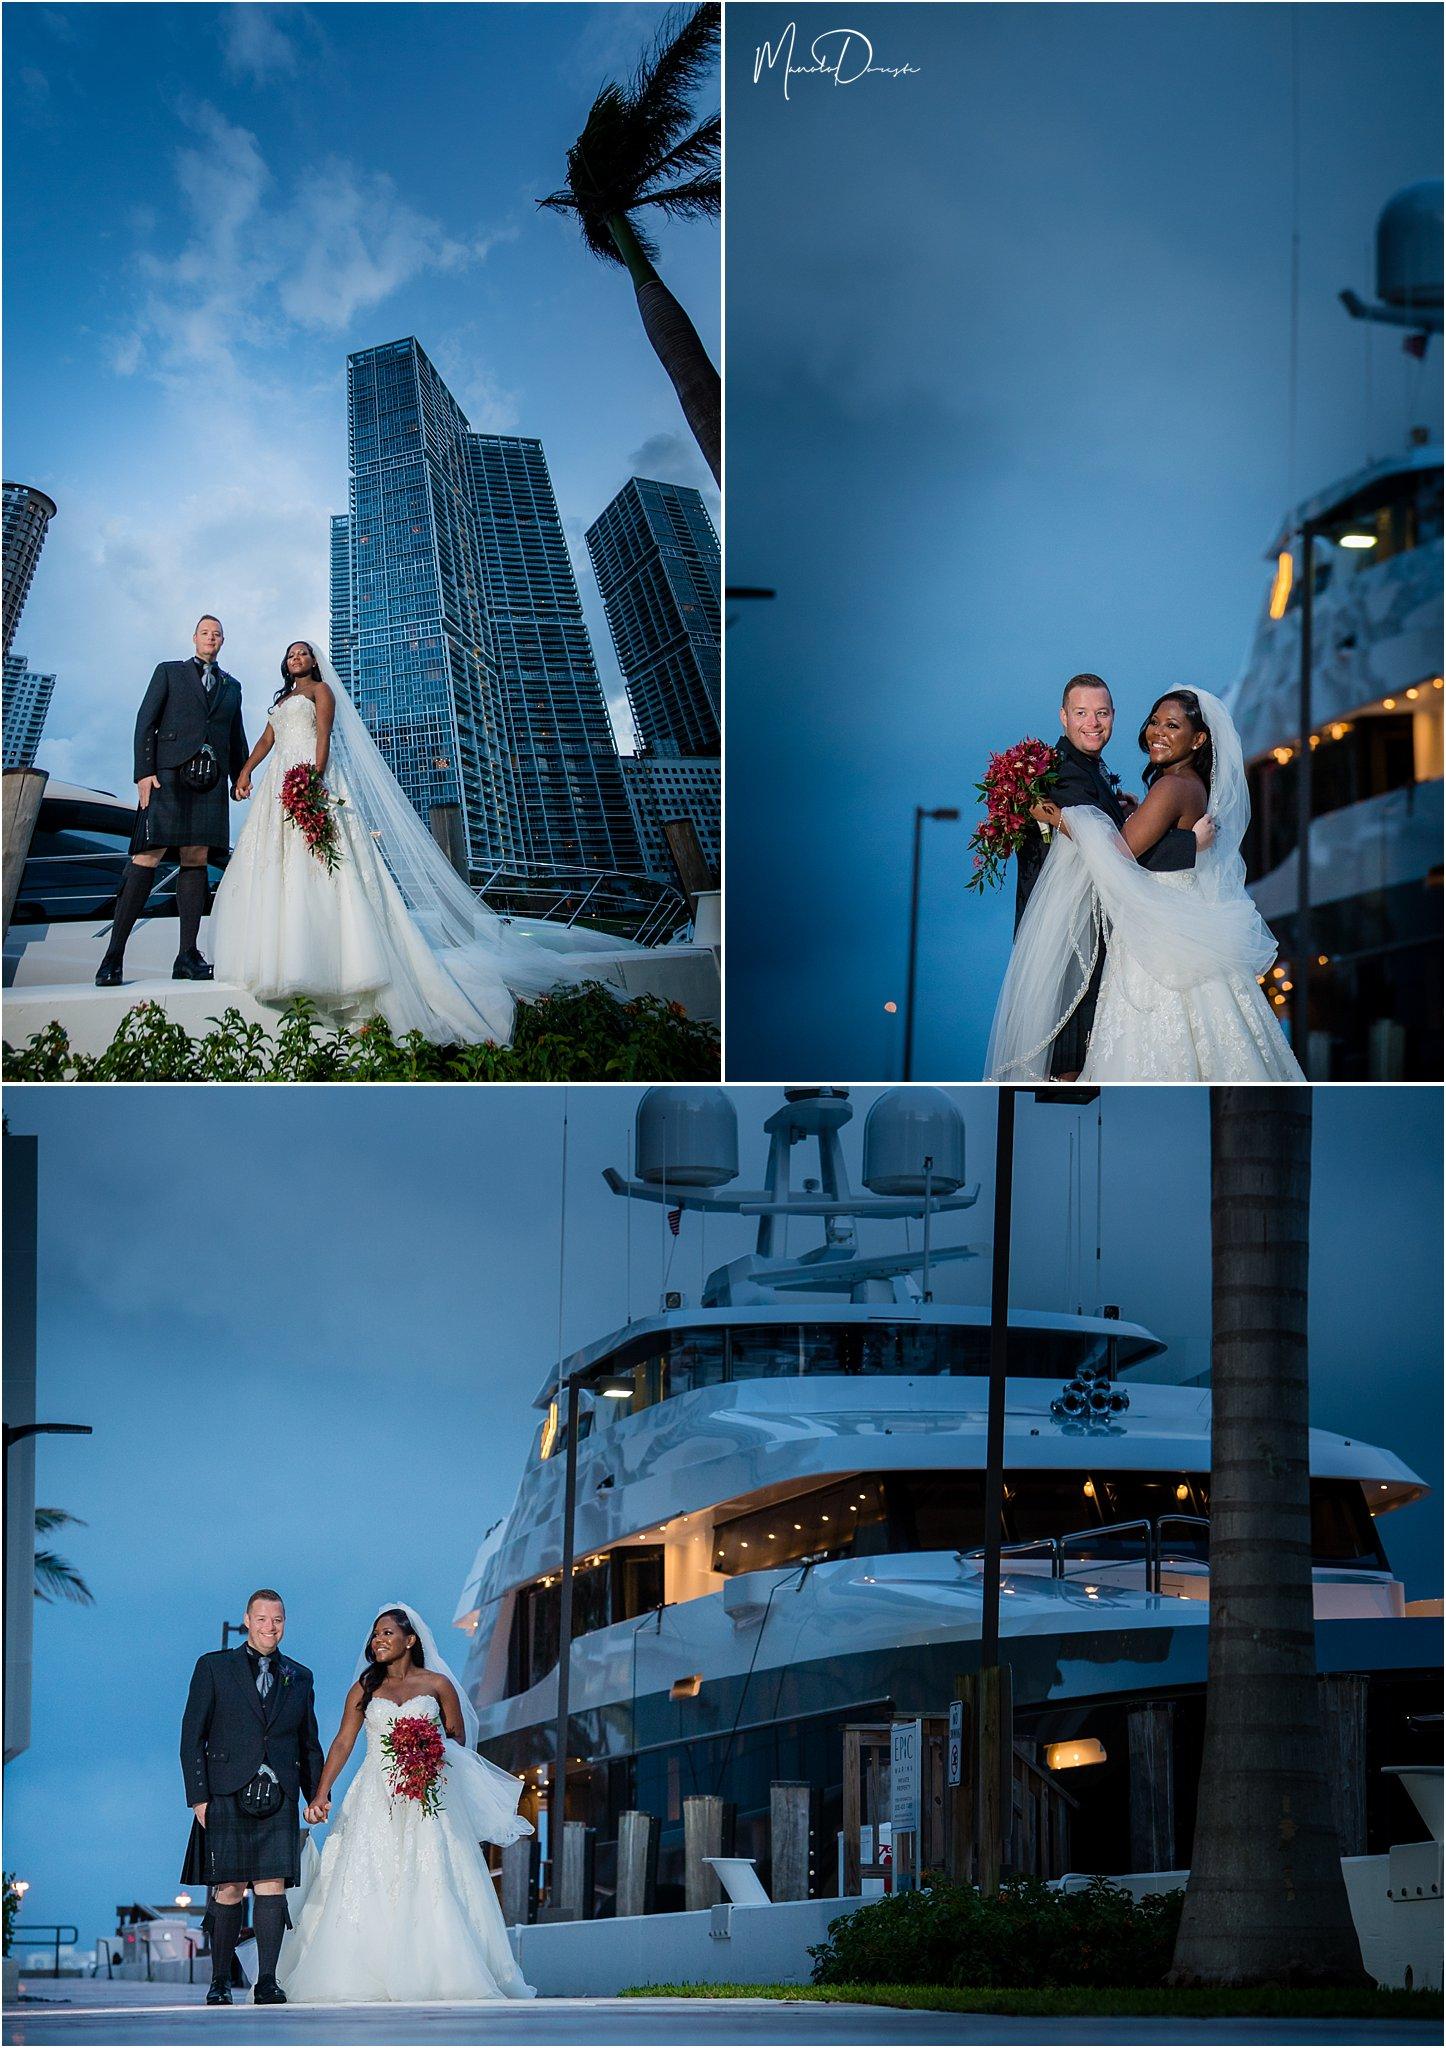 0124_ManoloDoreste_InFocusStudios_Wedding_Family_Photography_Miami_MiamiPhotographer.jpg